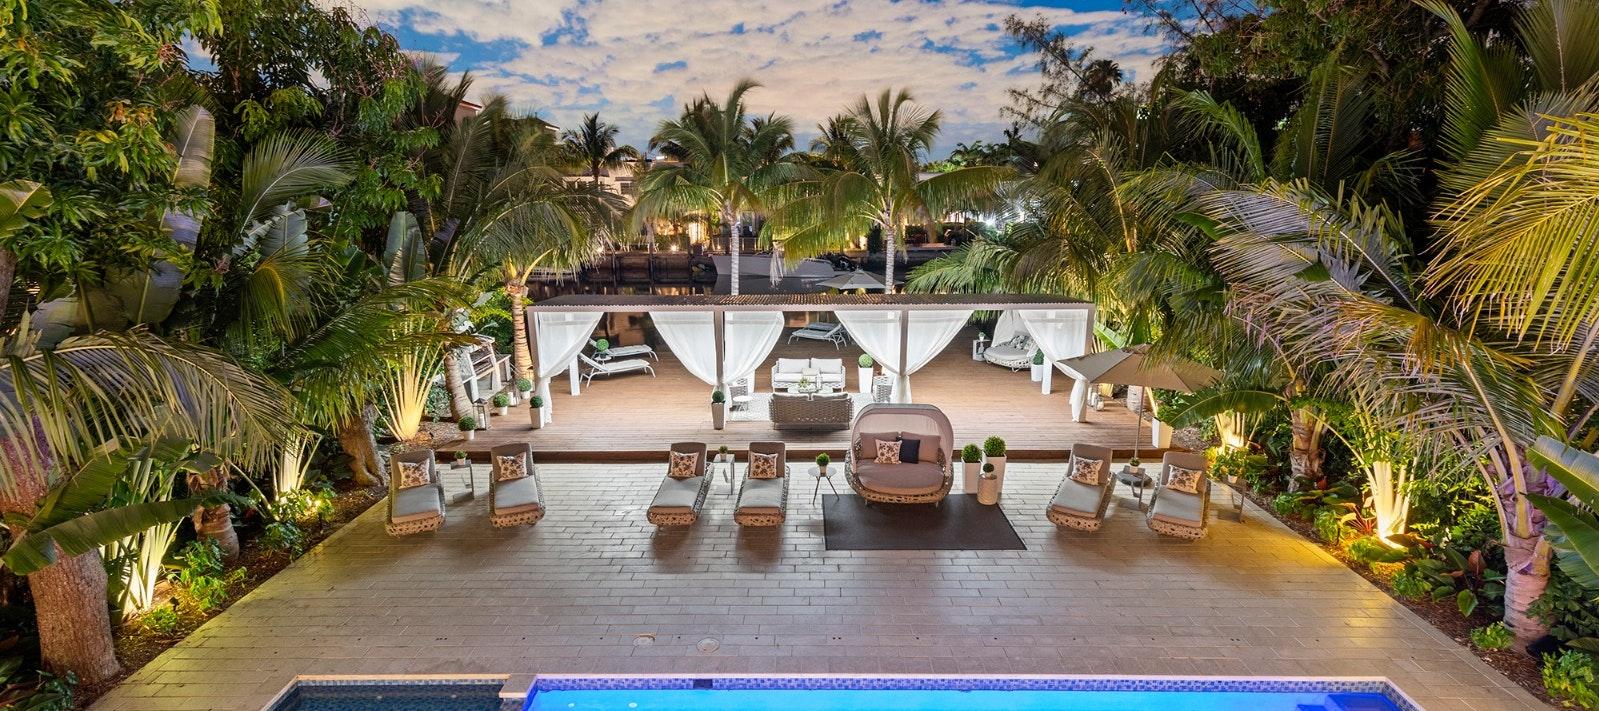 Villa Forge luxury rental in Miami Beach